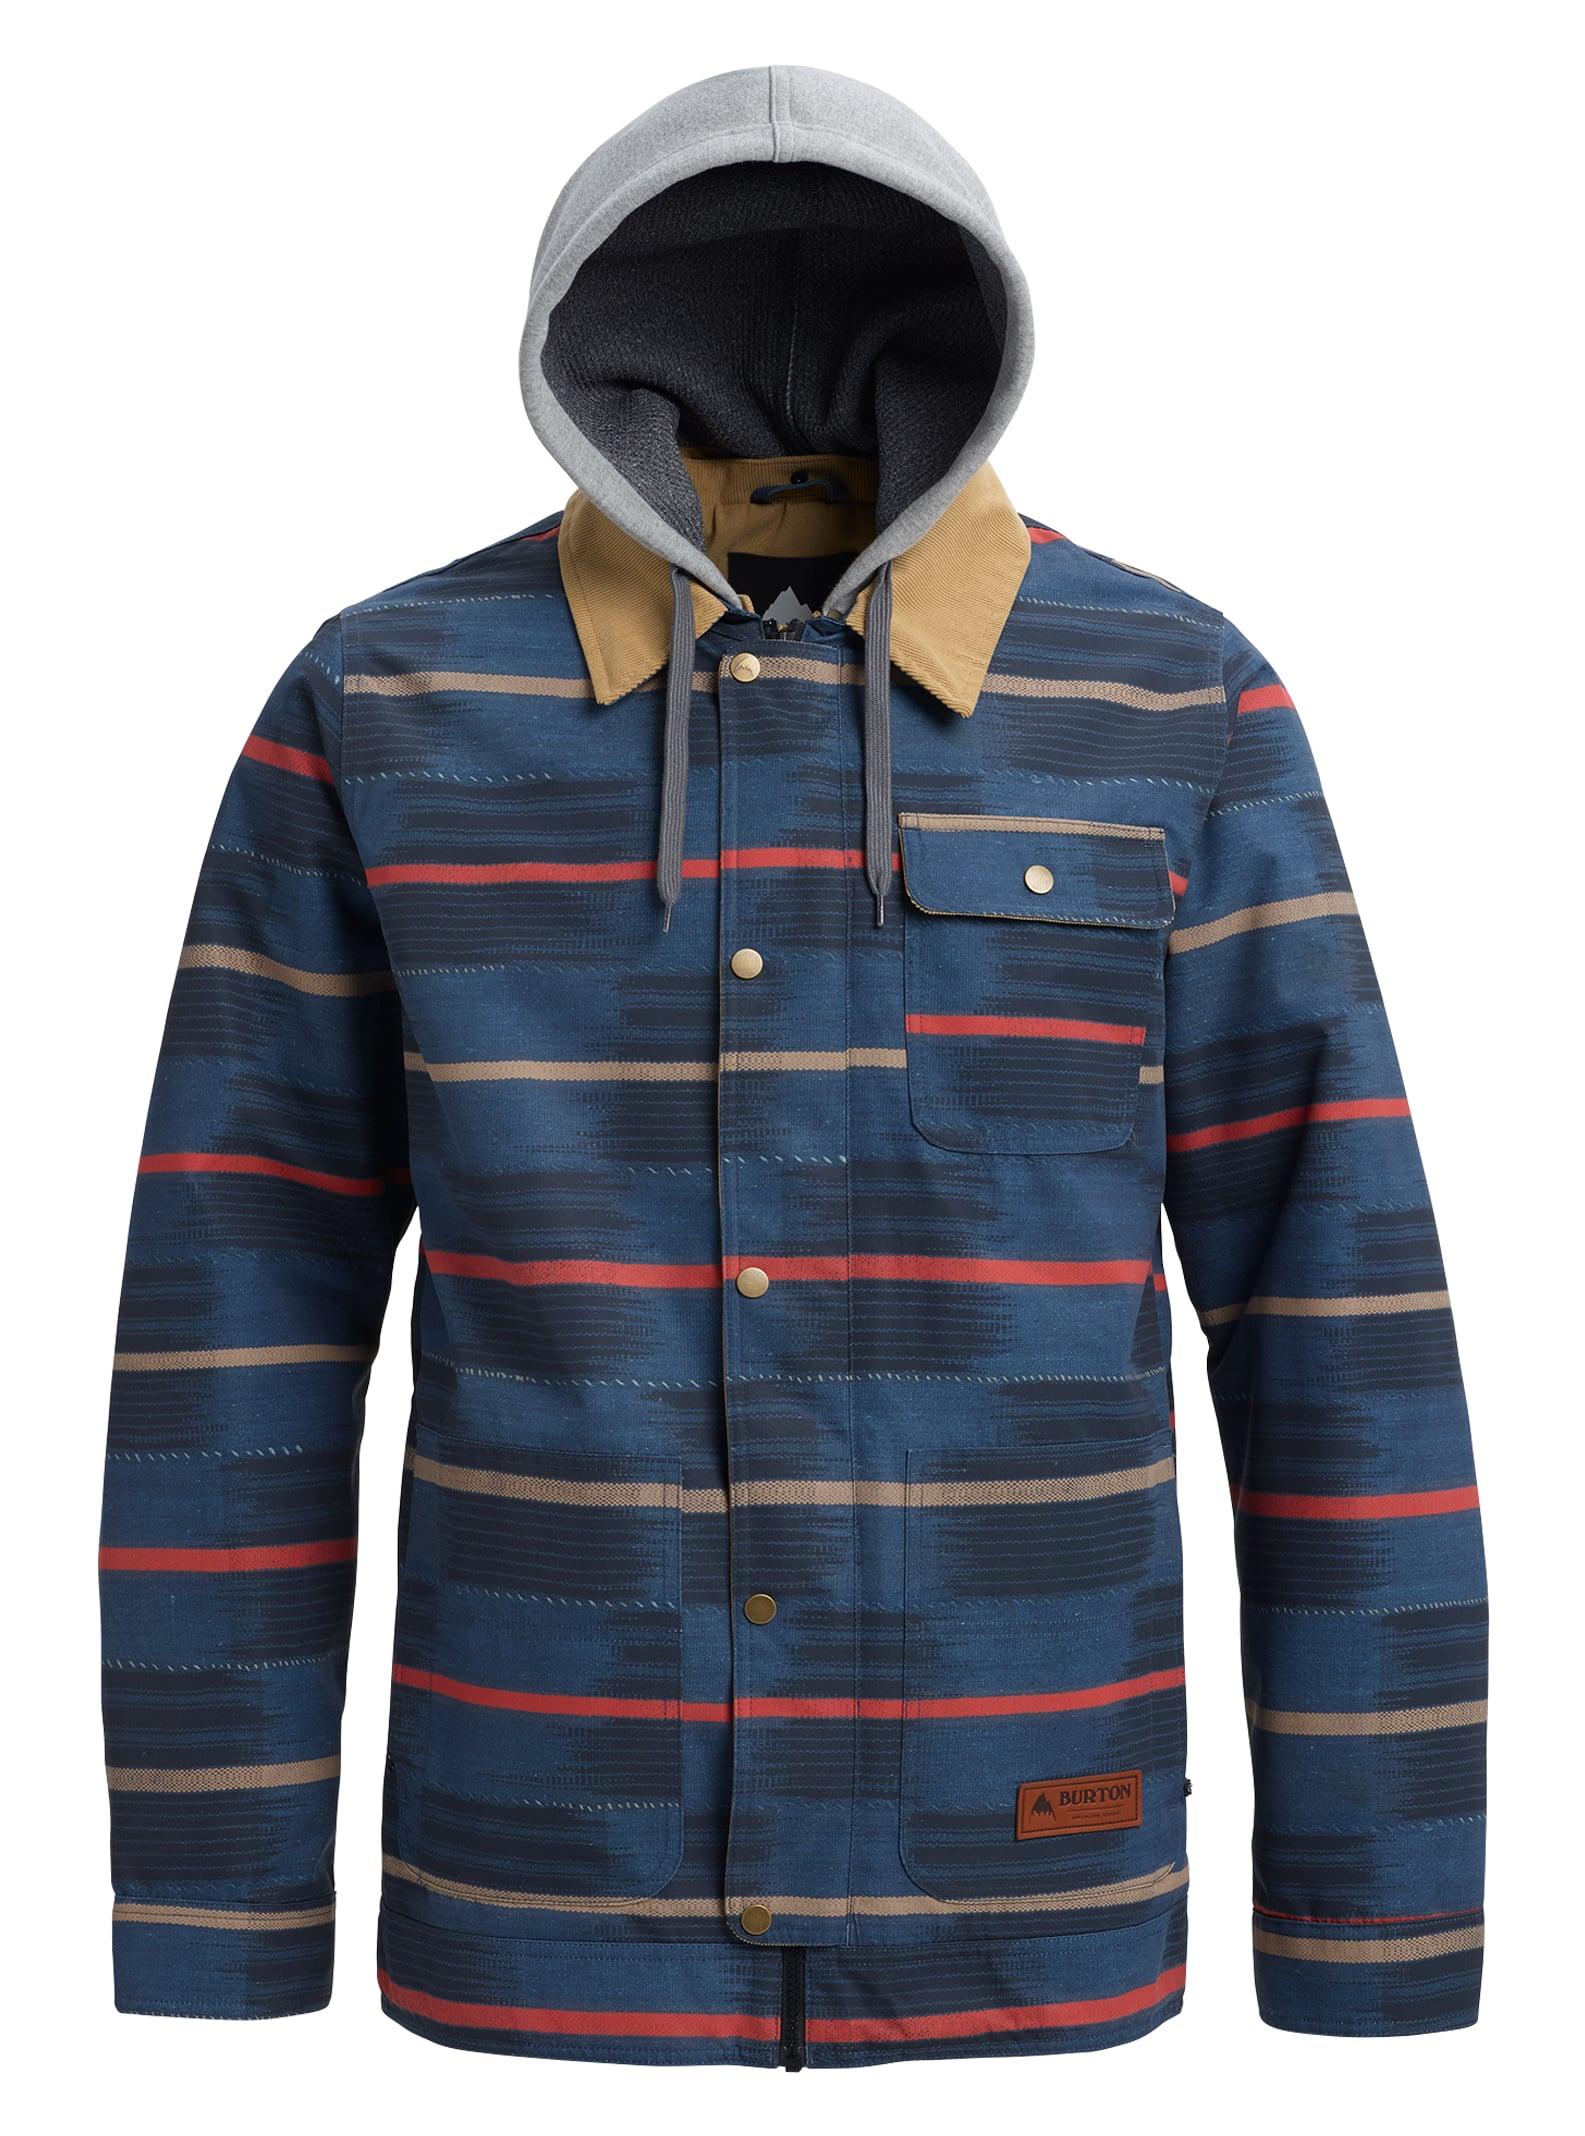 310c32e3c Sale Clothing & Gear   Burton Snowboards